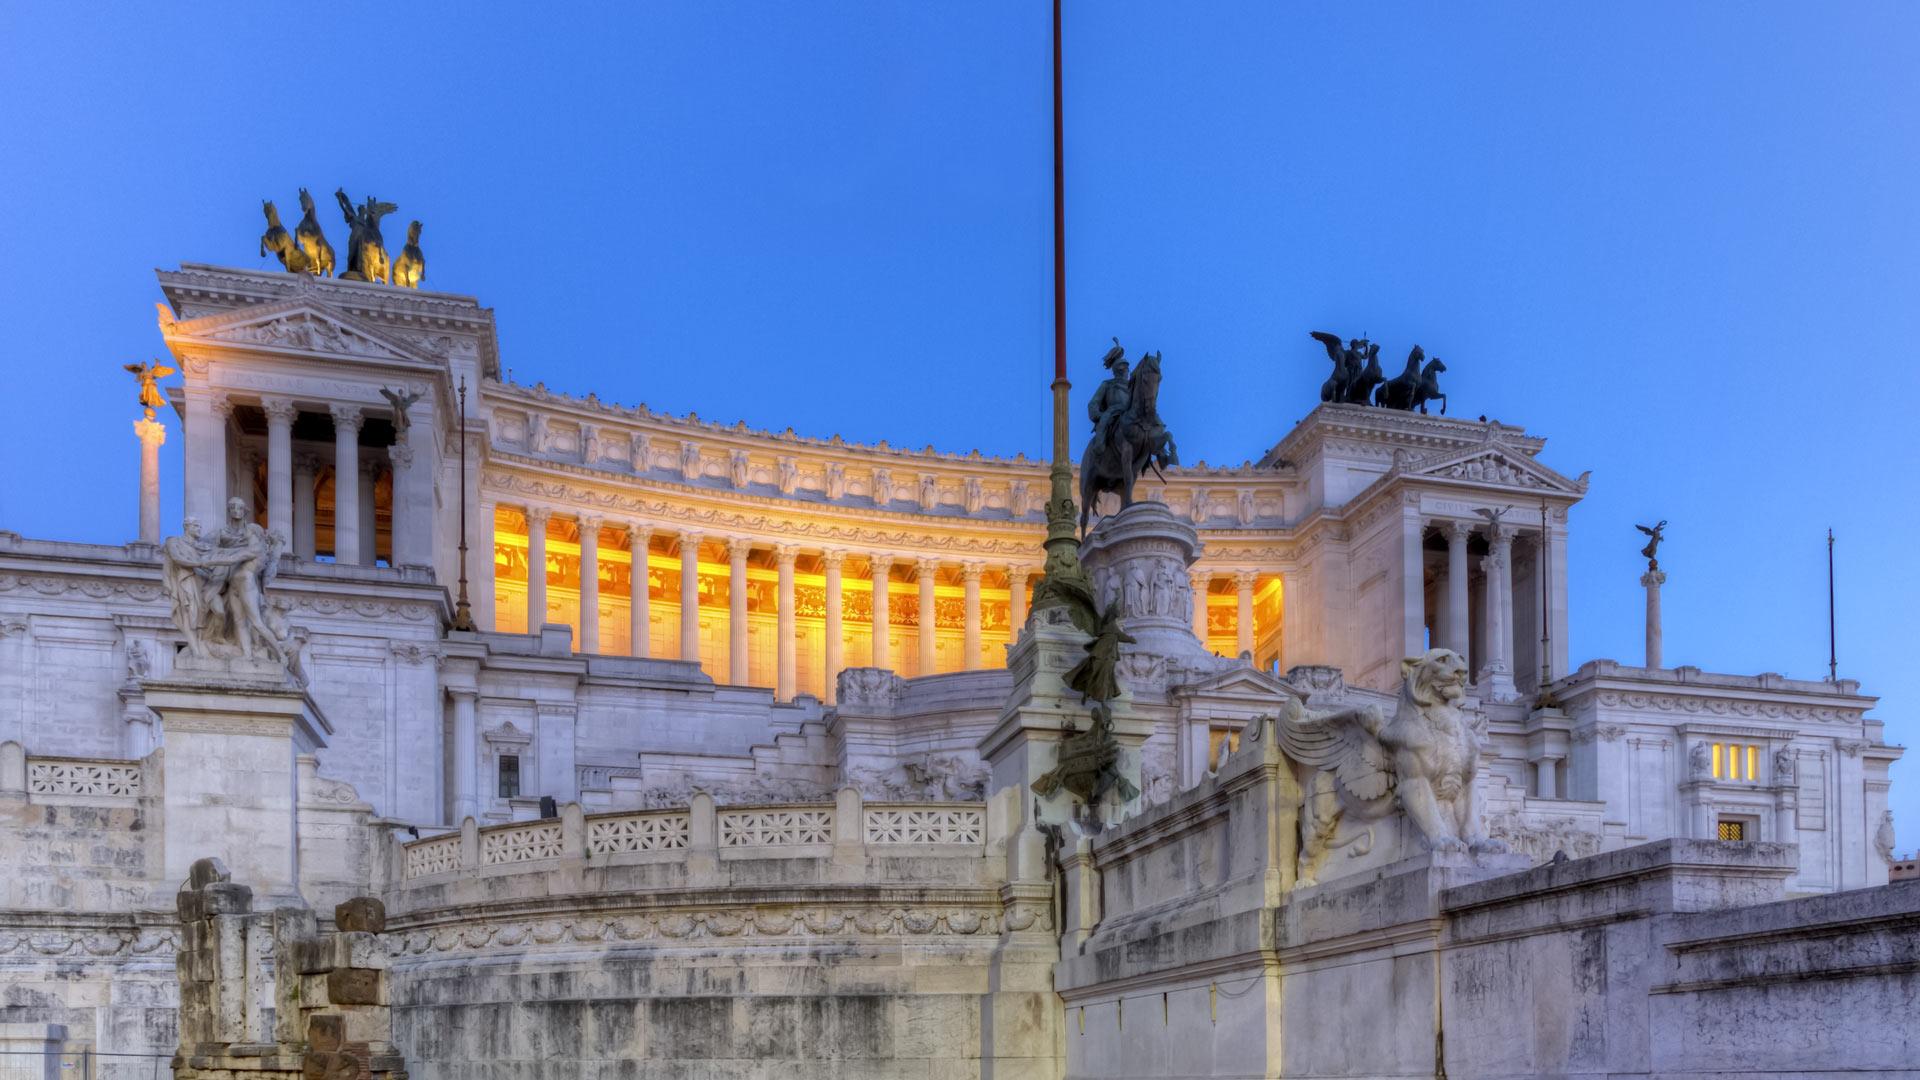 National Monument to Victor Emmanuel II, Altar of the Fatherland, Altare della Patria, in Rome, Italy